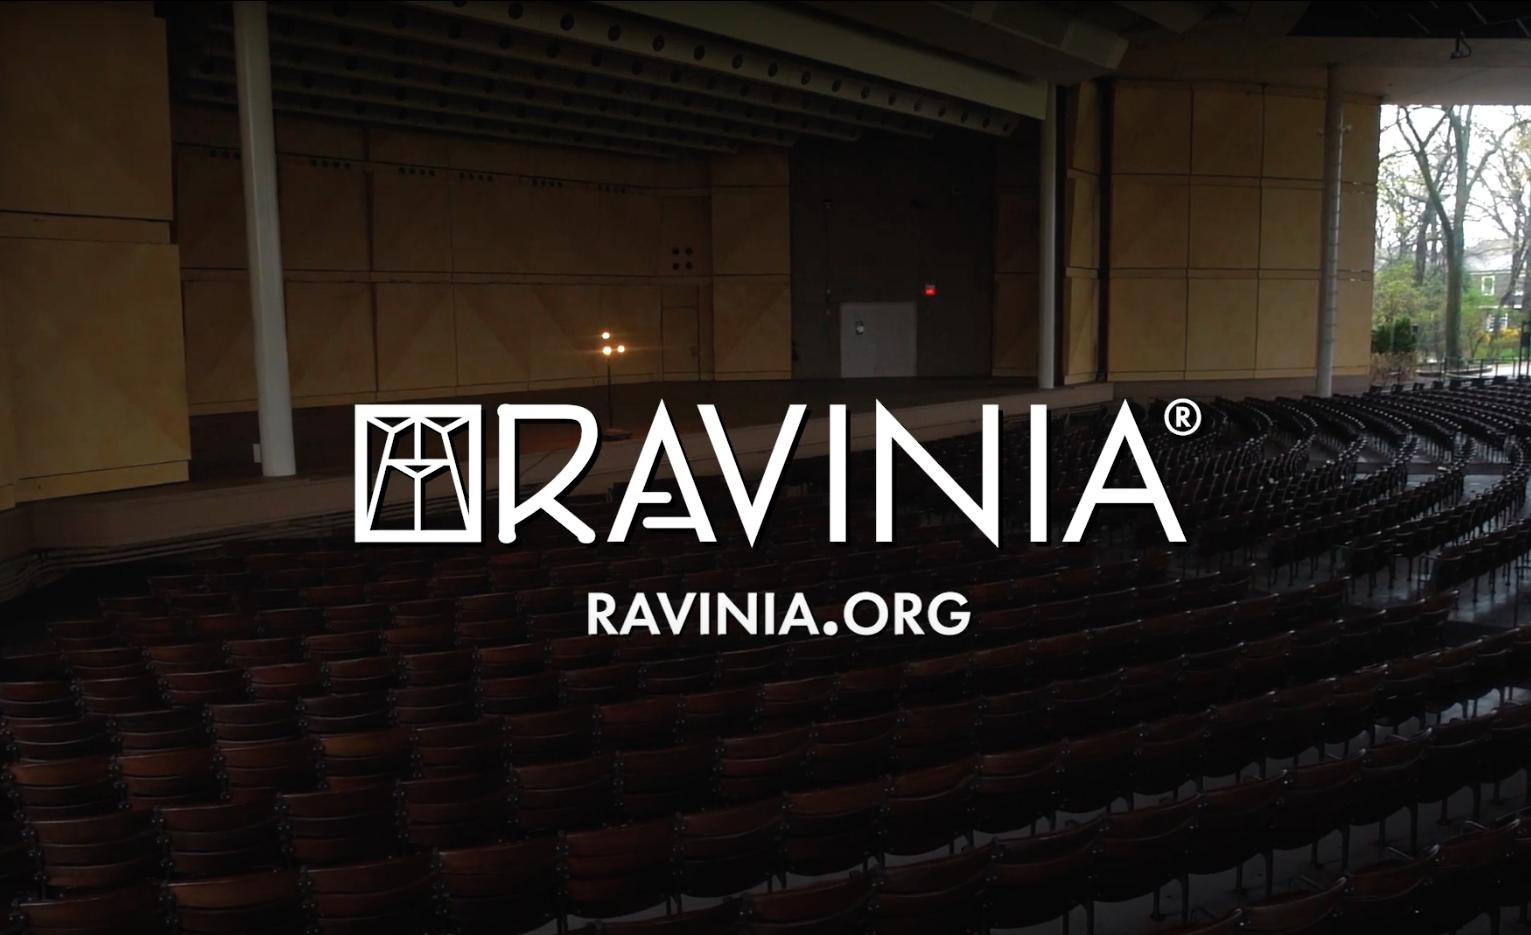 RAVINIA FESTIVAL LAUNCHES WEEKLY RAVINIA TV